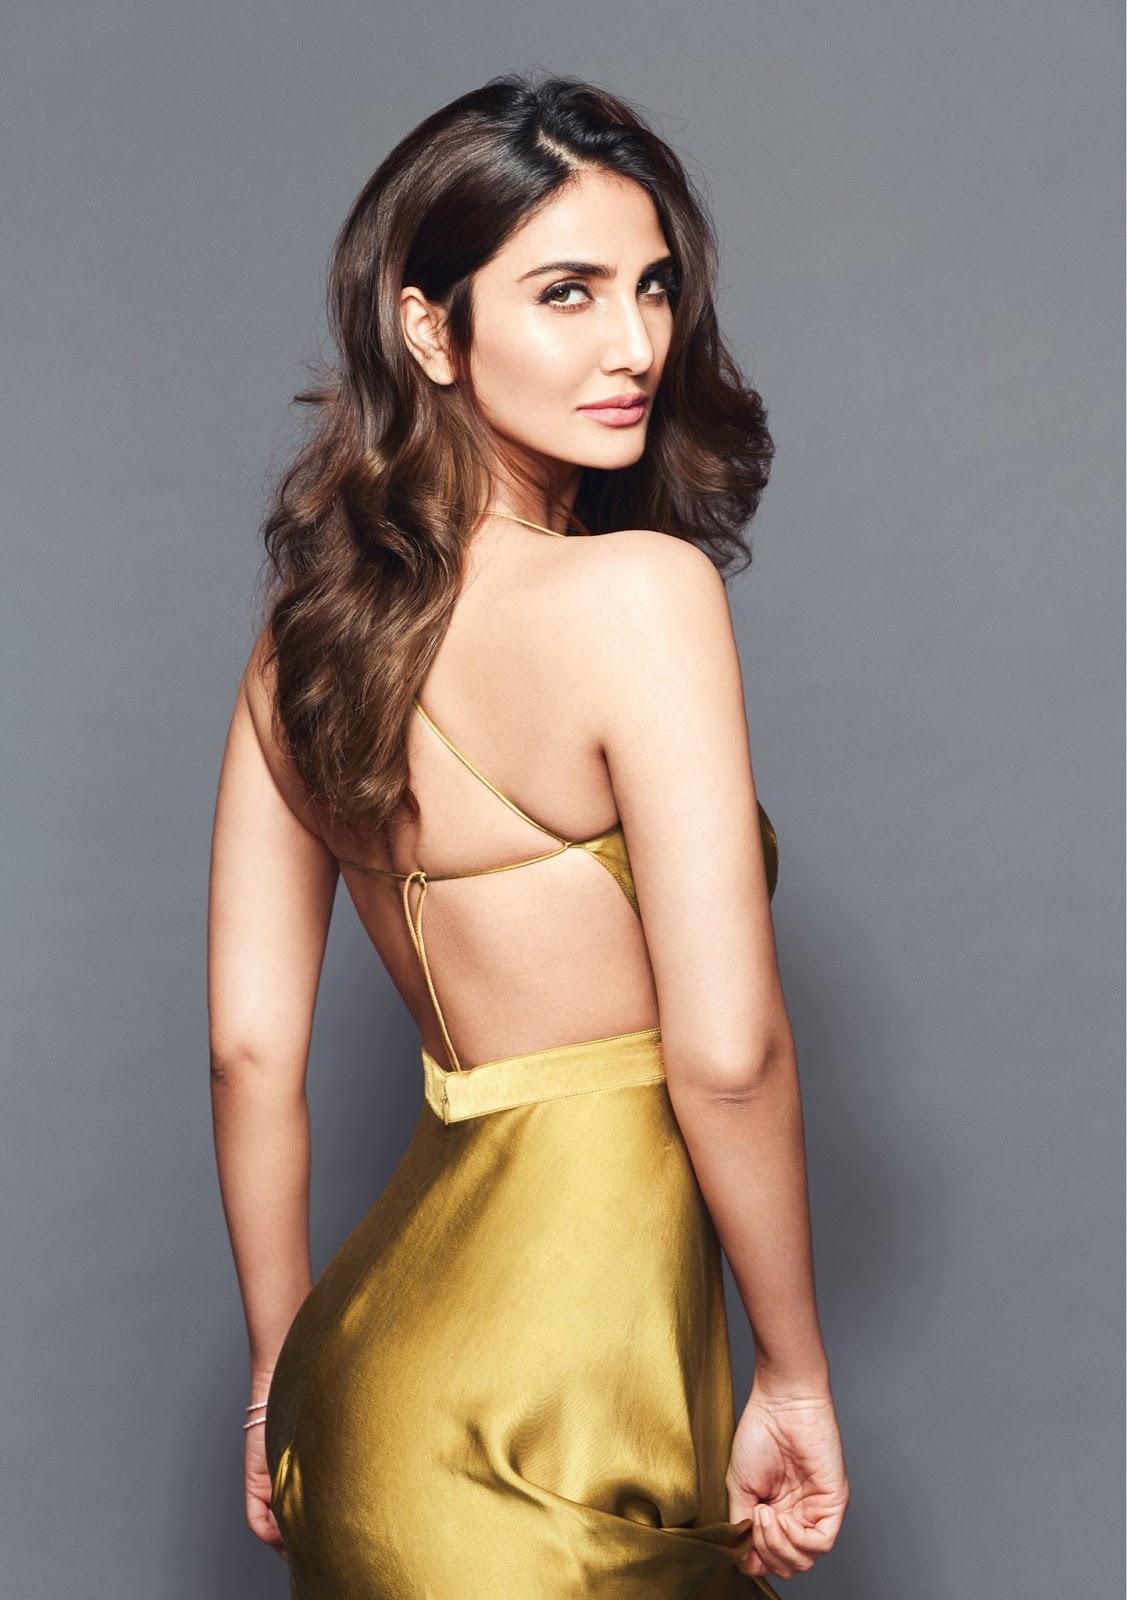 Vaani Kapoor Hot & Sexy HD Wallpaper, Images And Photos Download -  Wallpaper HD Photos